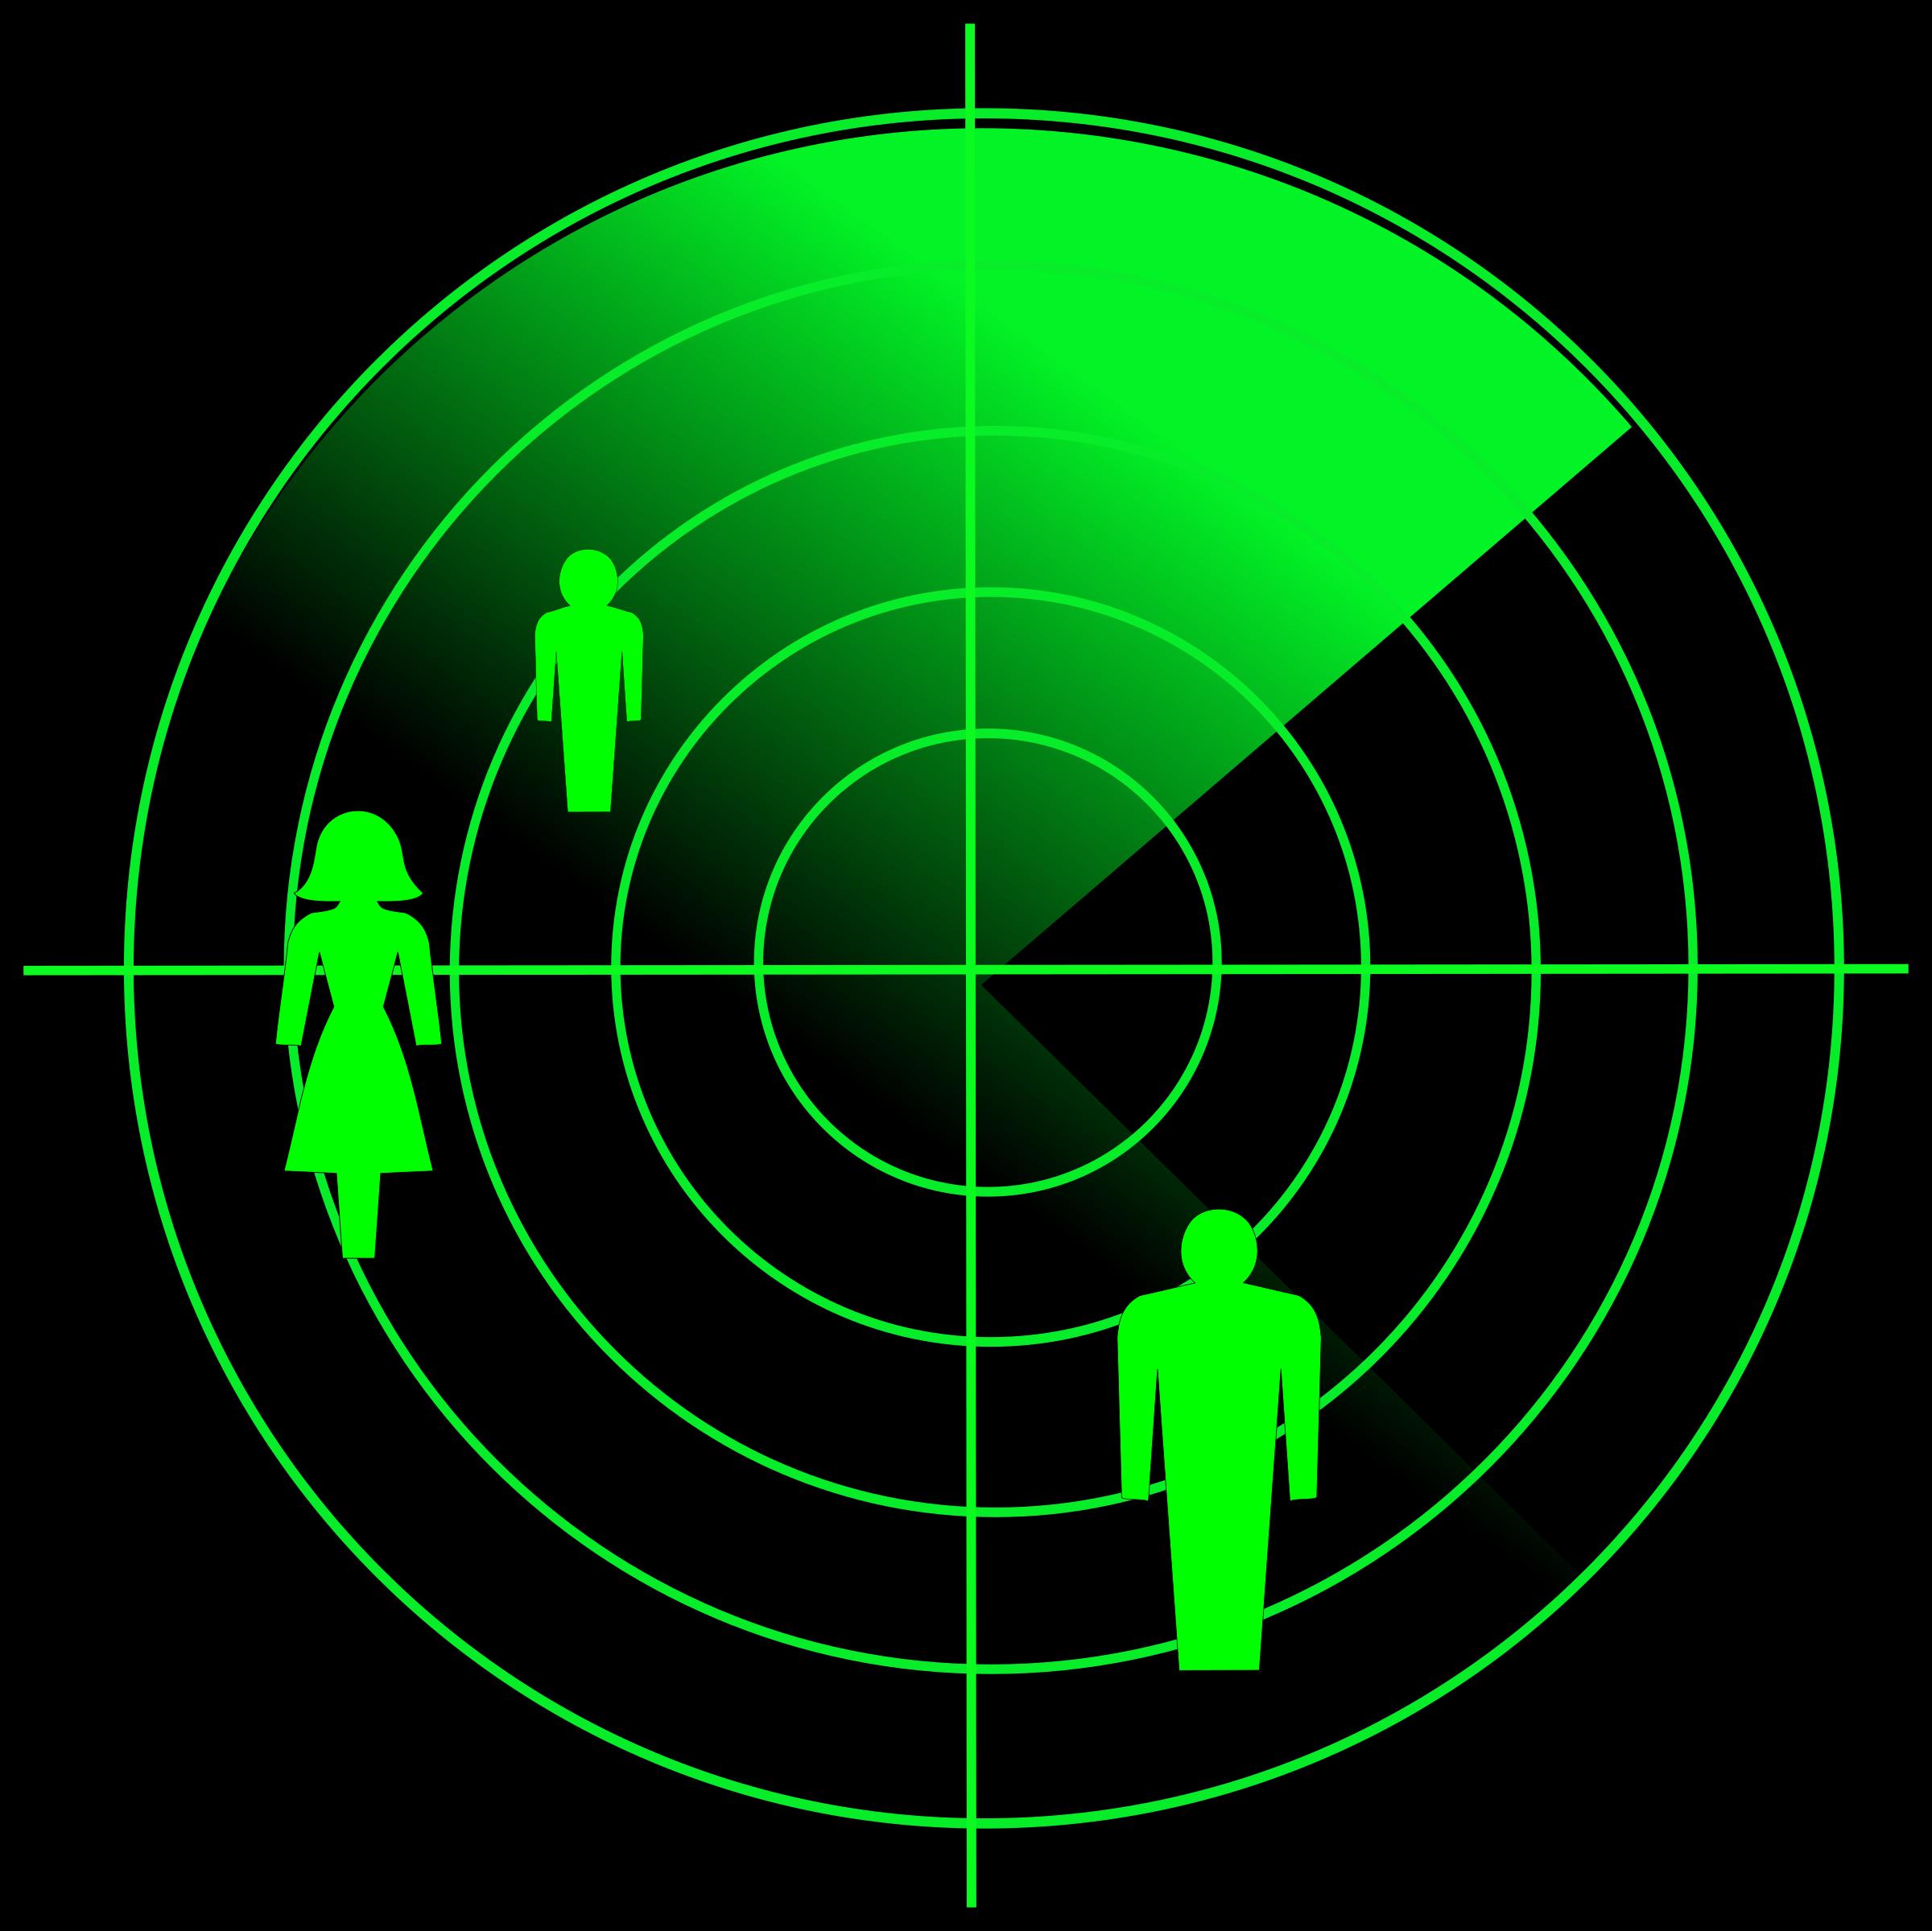 People radar vector clipart image.